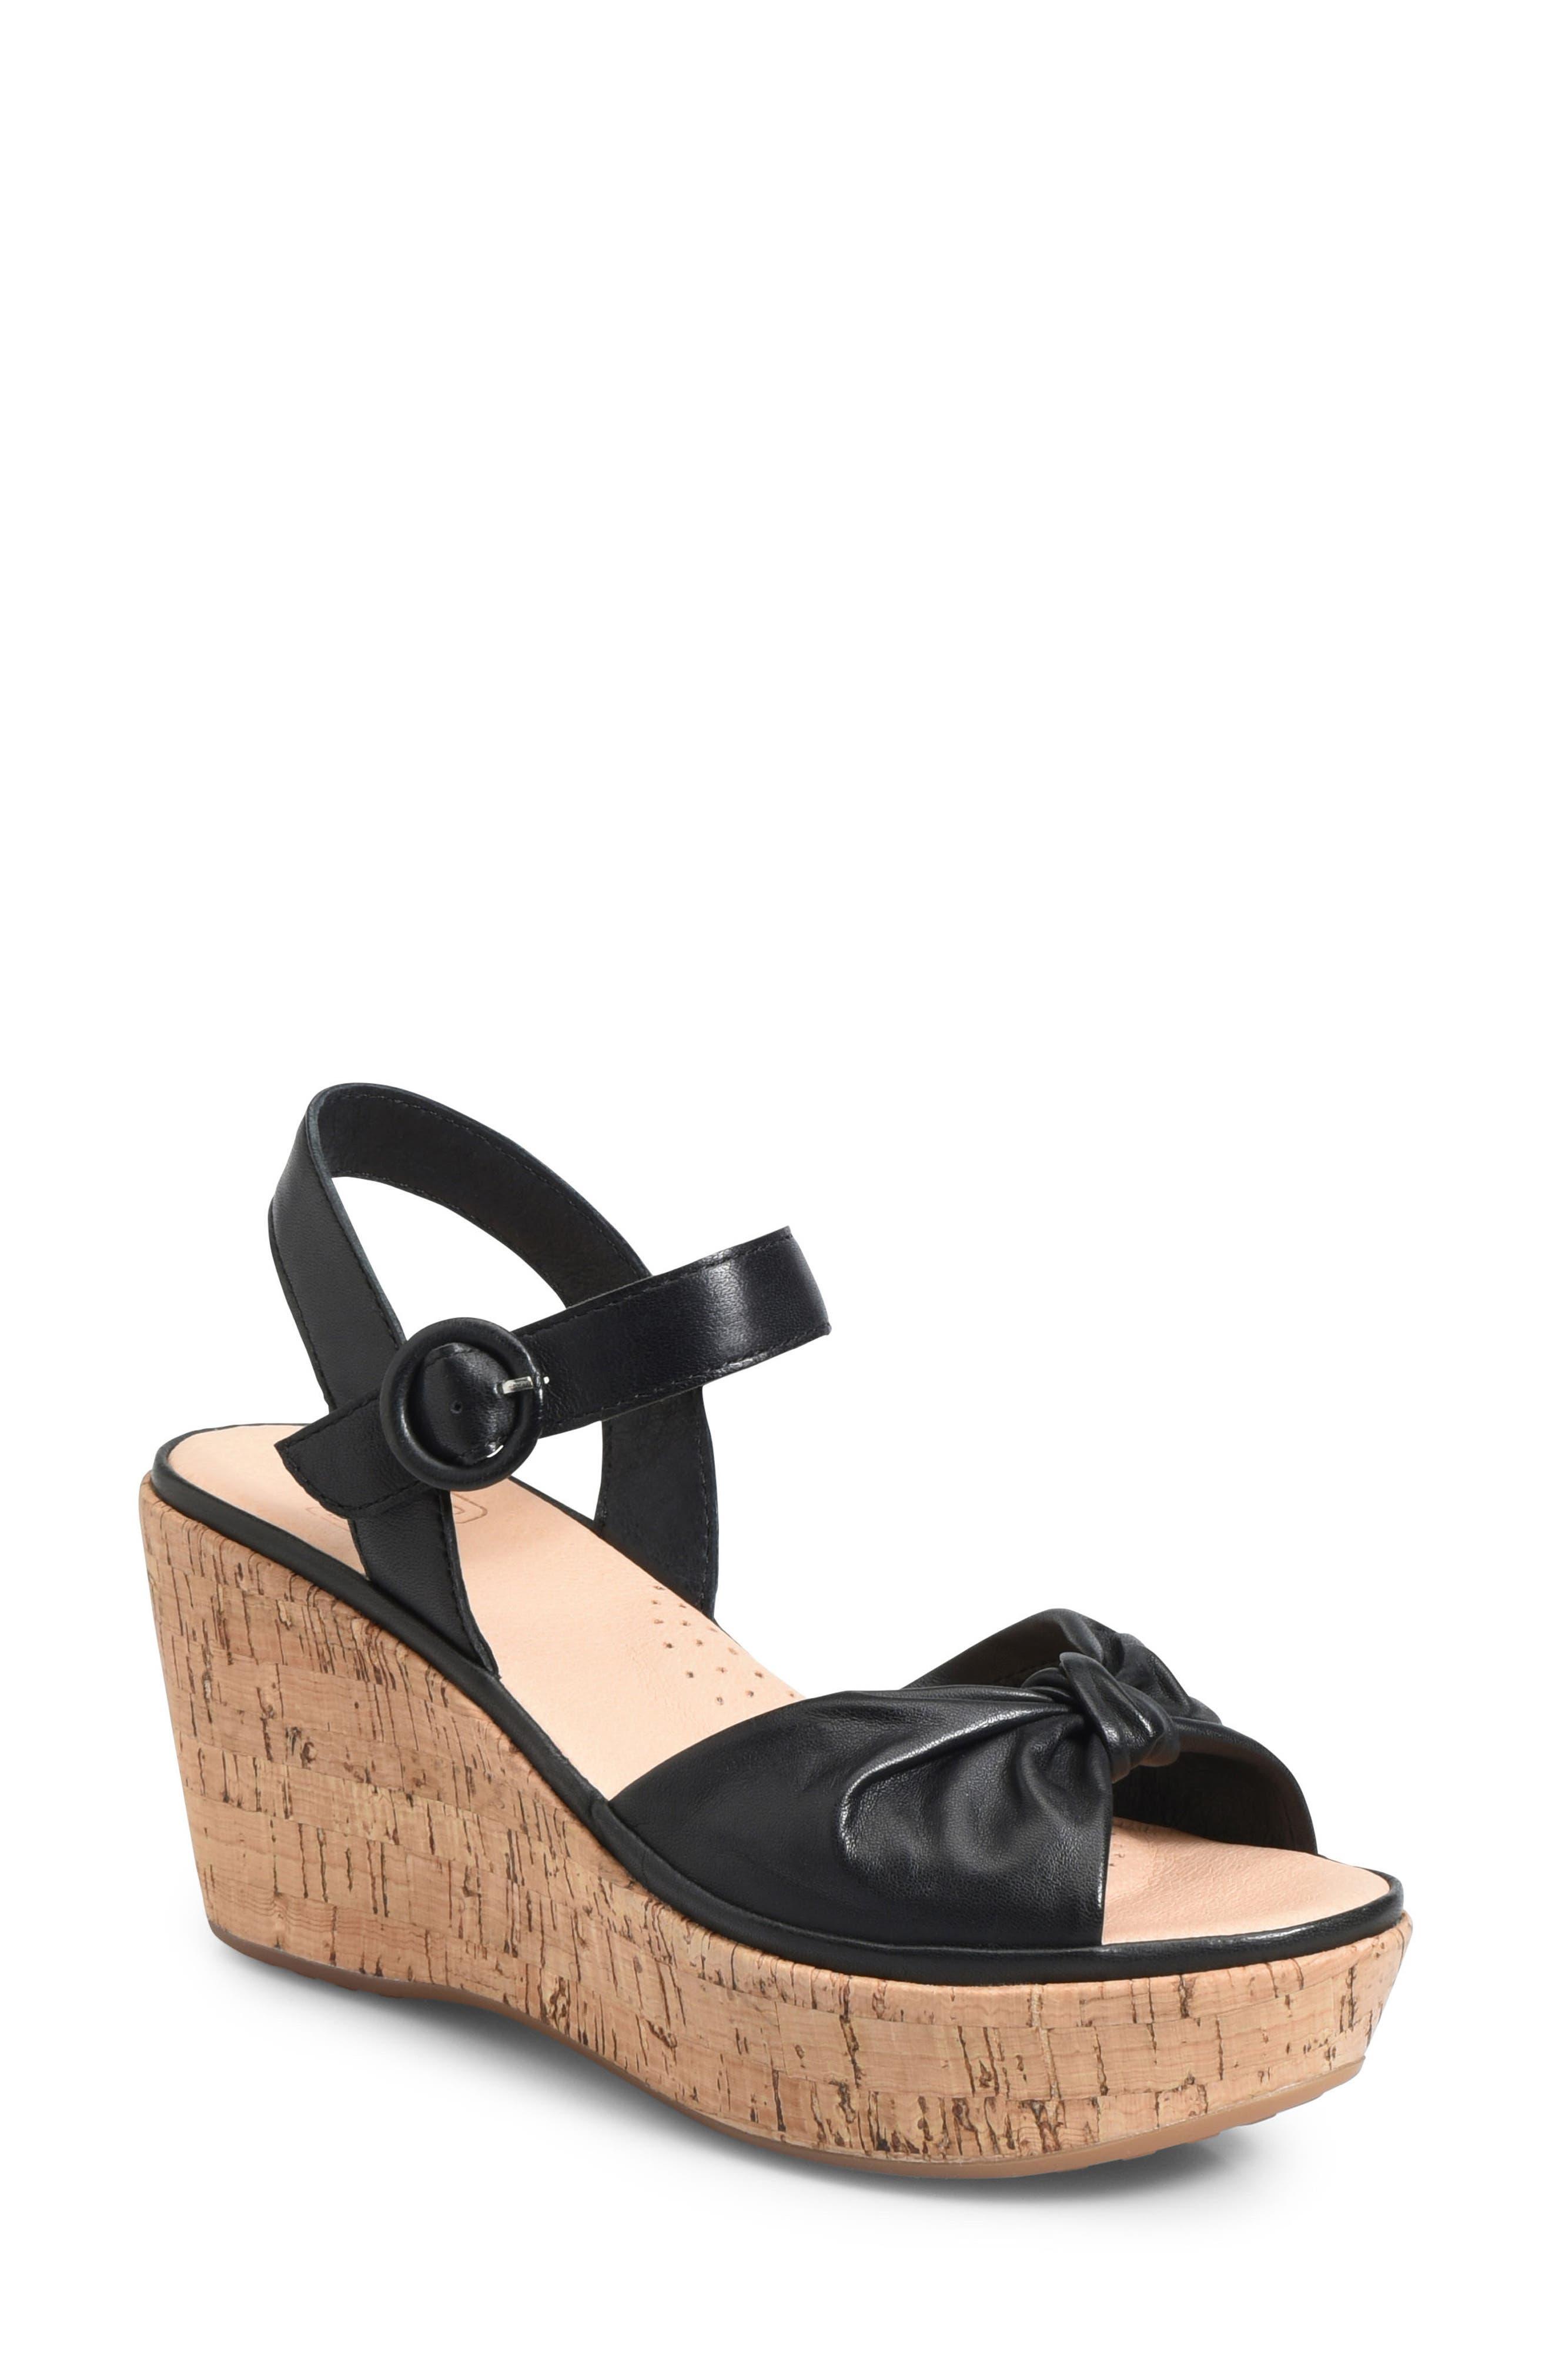 Ono Heavenly Platform Wedge Sandal, Black